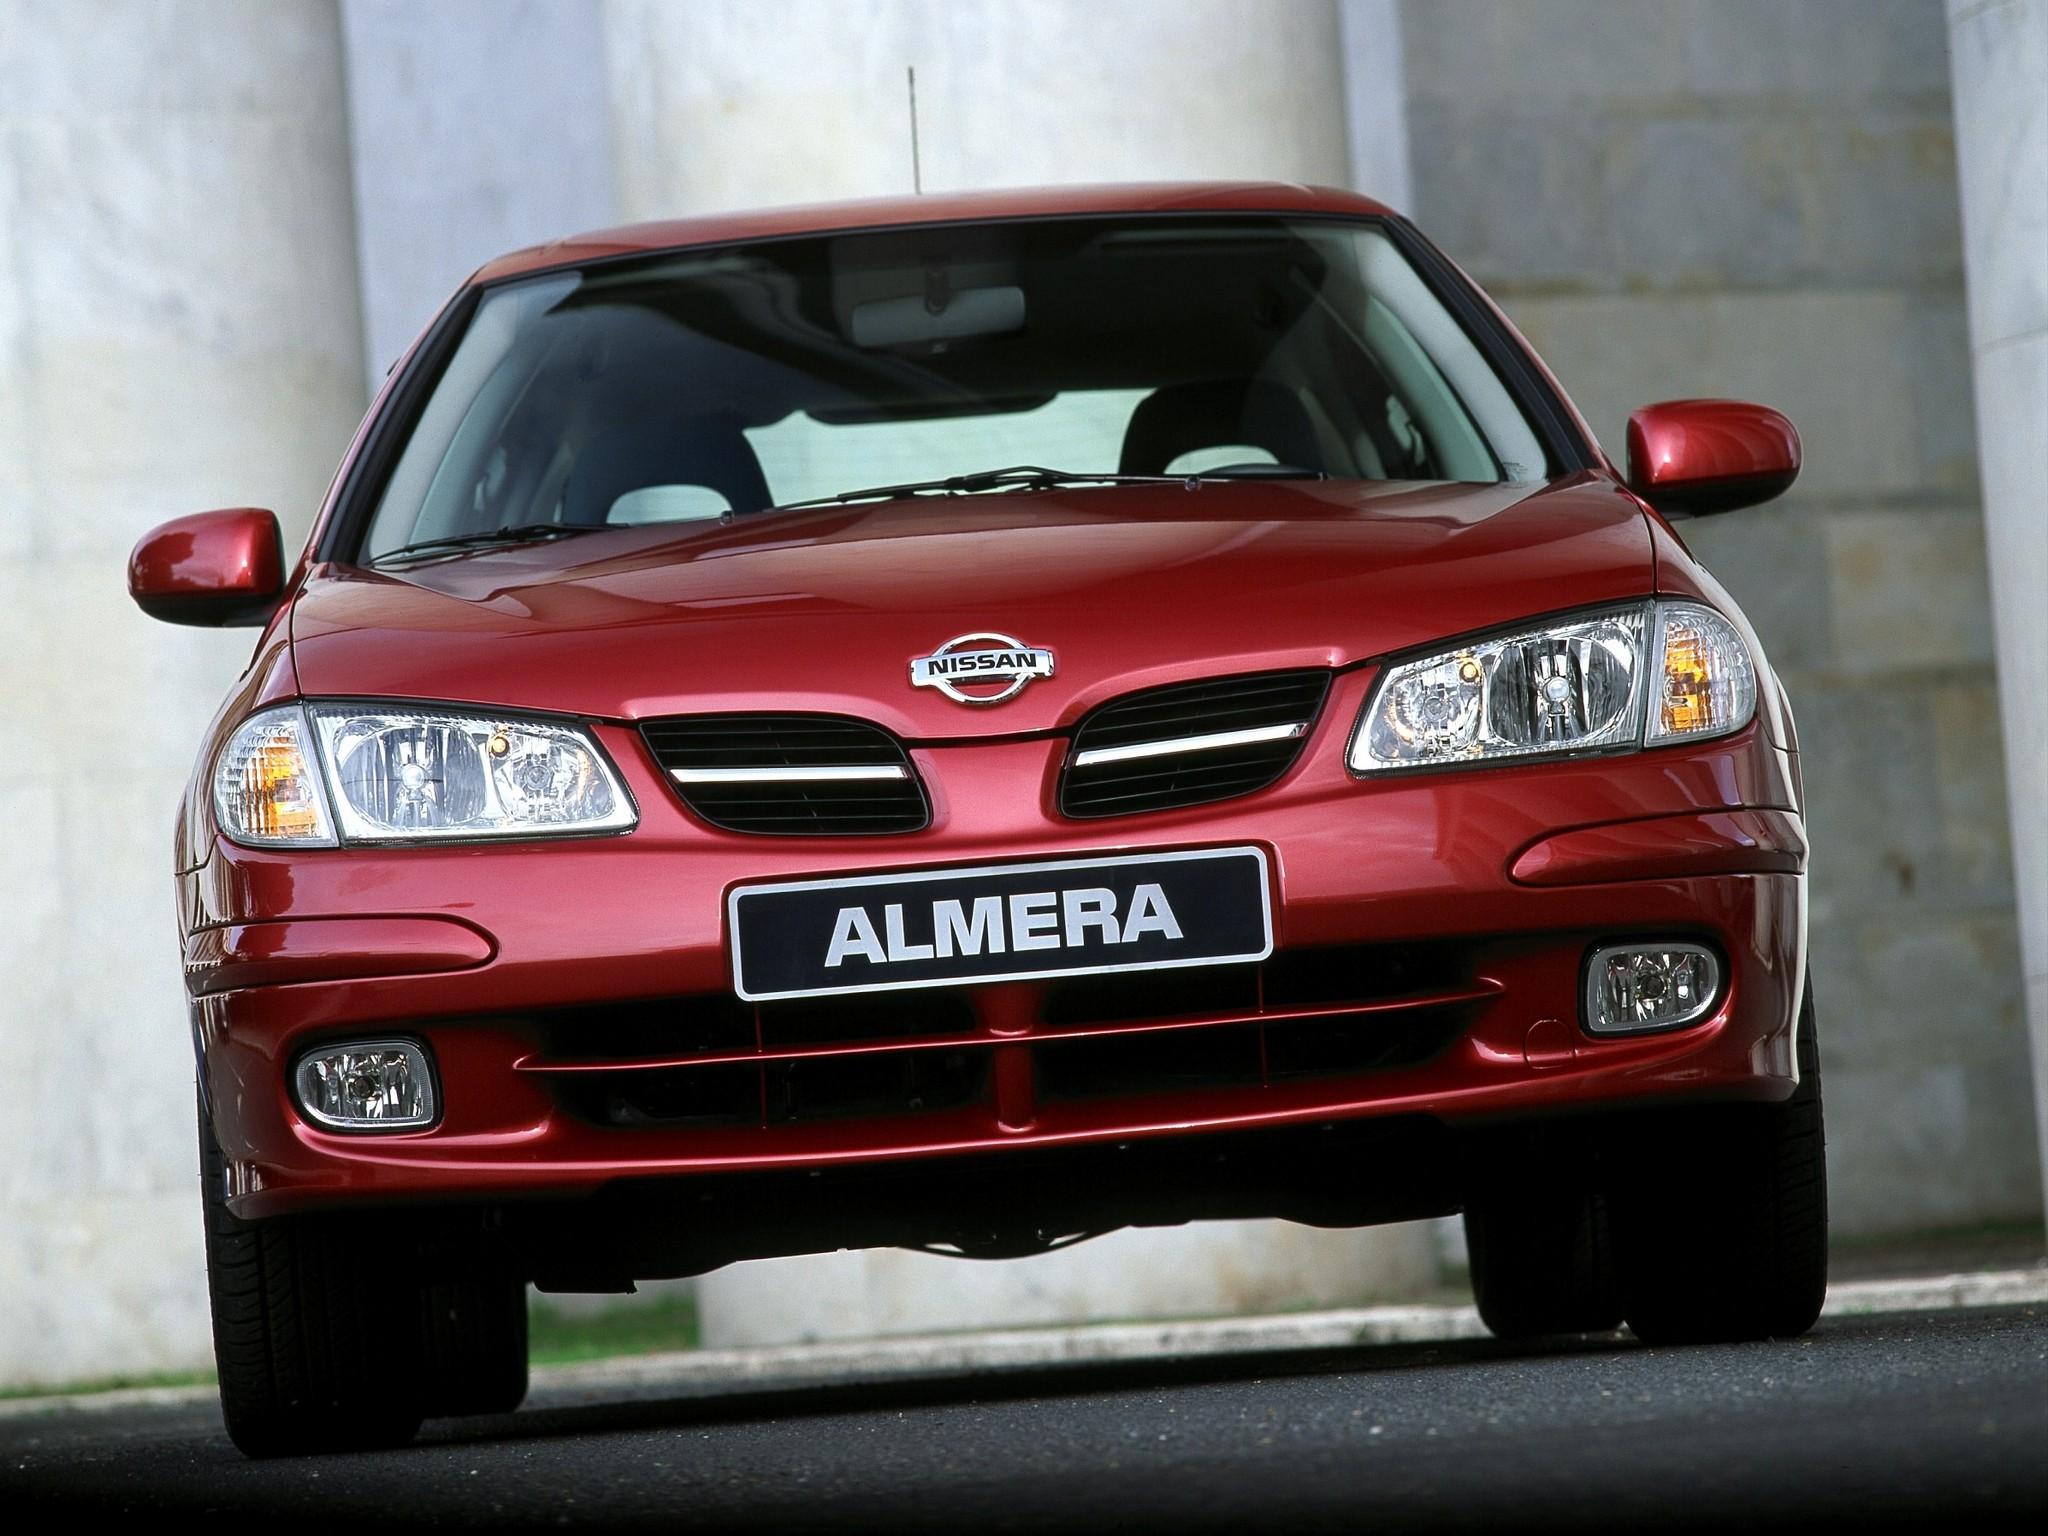 NISSAN Almera / Pulsar 5 Doors specs & photos - 2000, 2001 ...